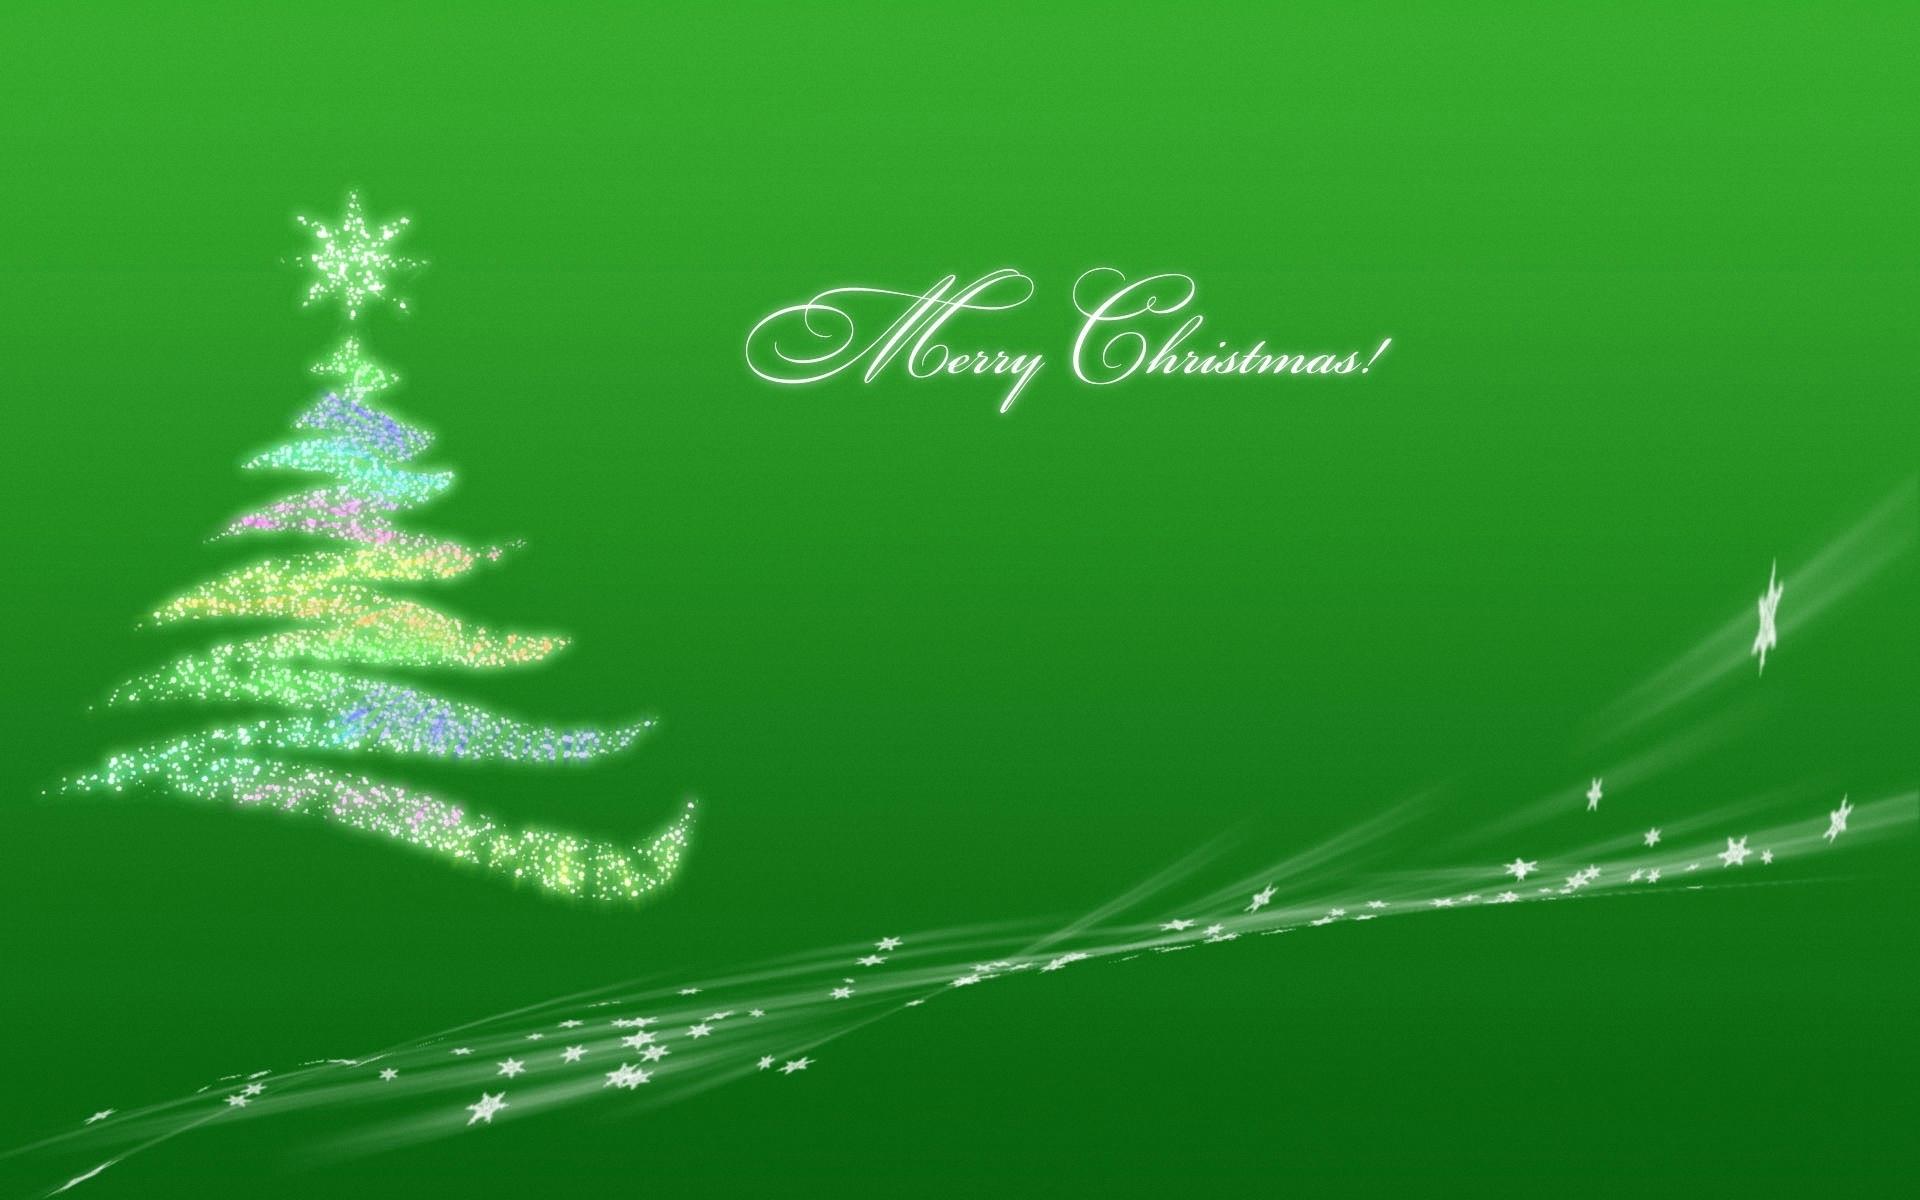 Christmas wallpaper   Christmas Wallpaper 22227615 1920x1200